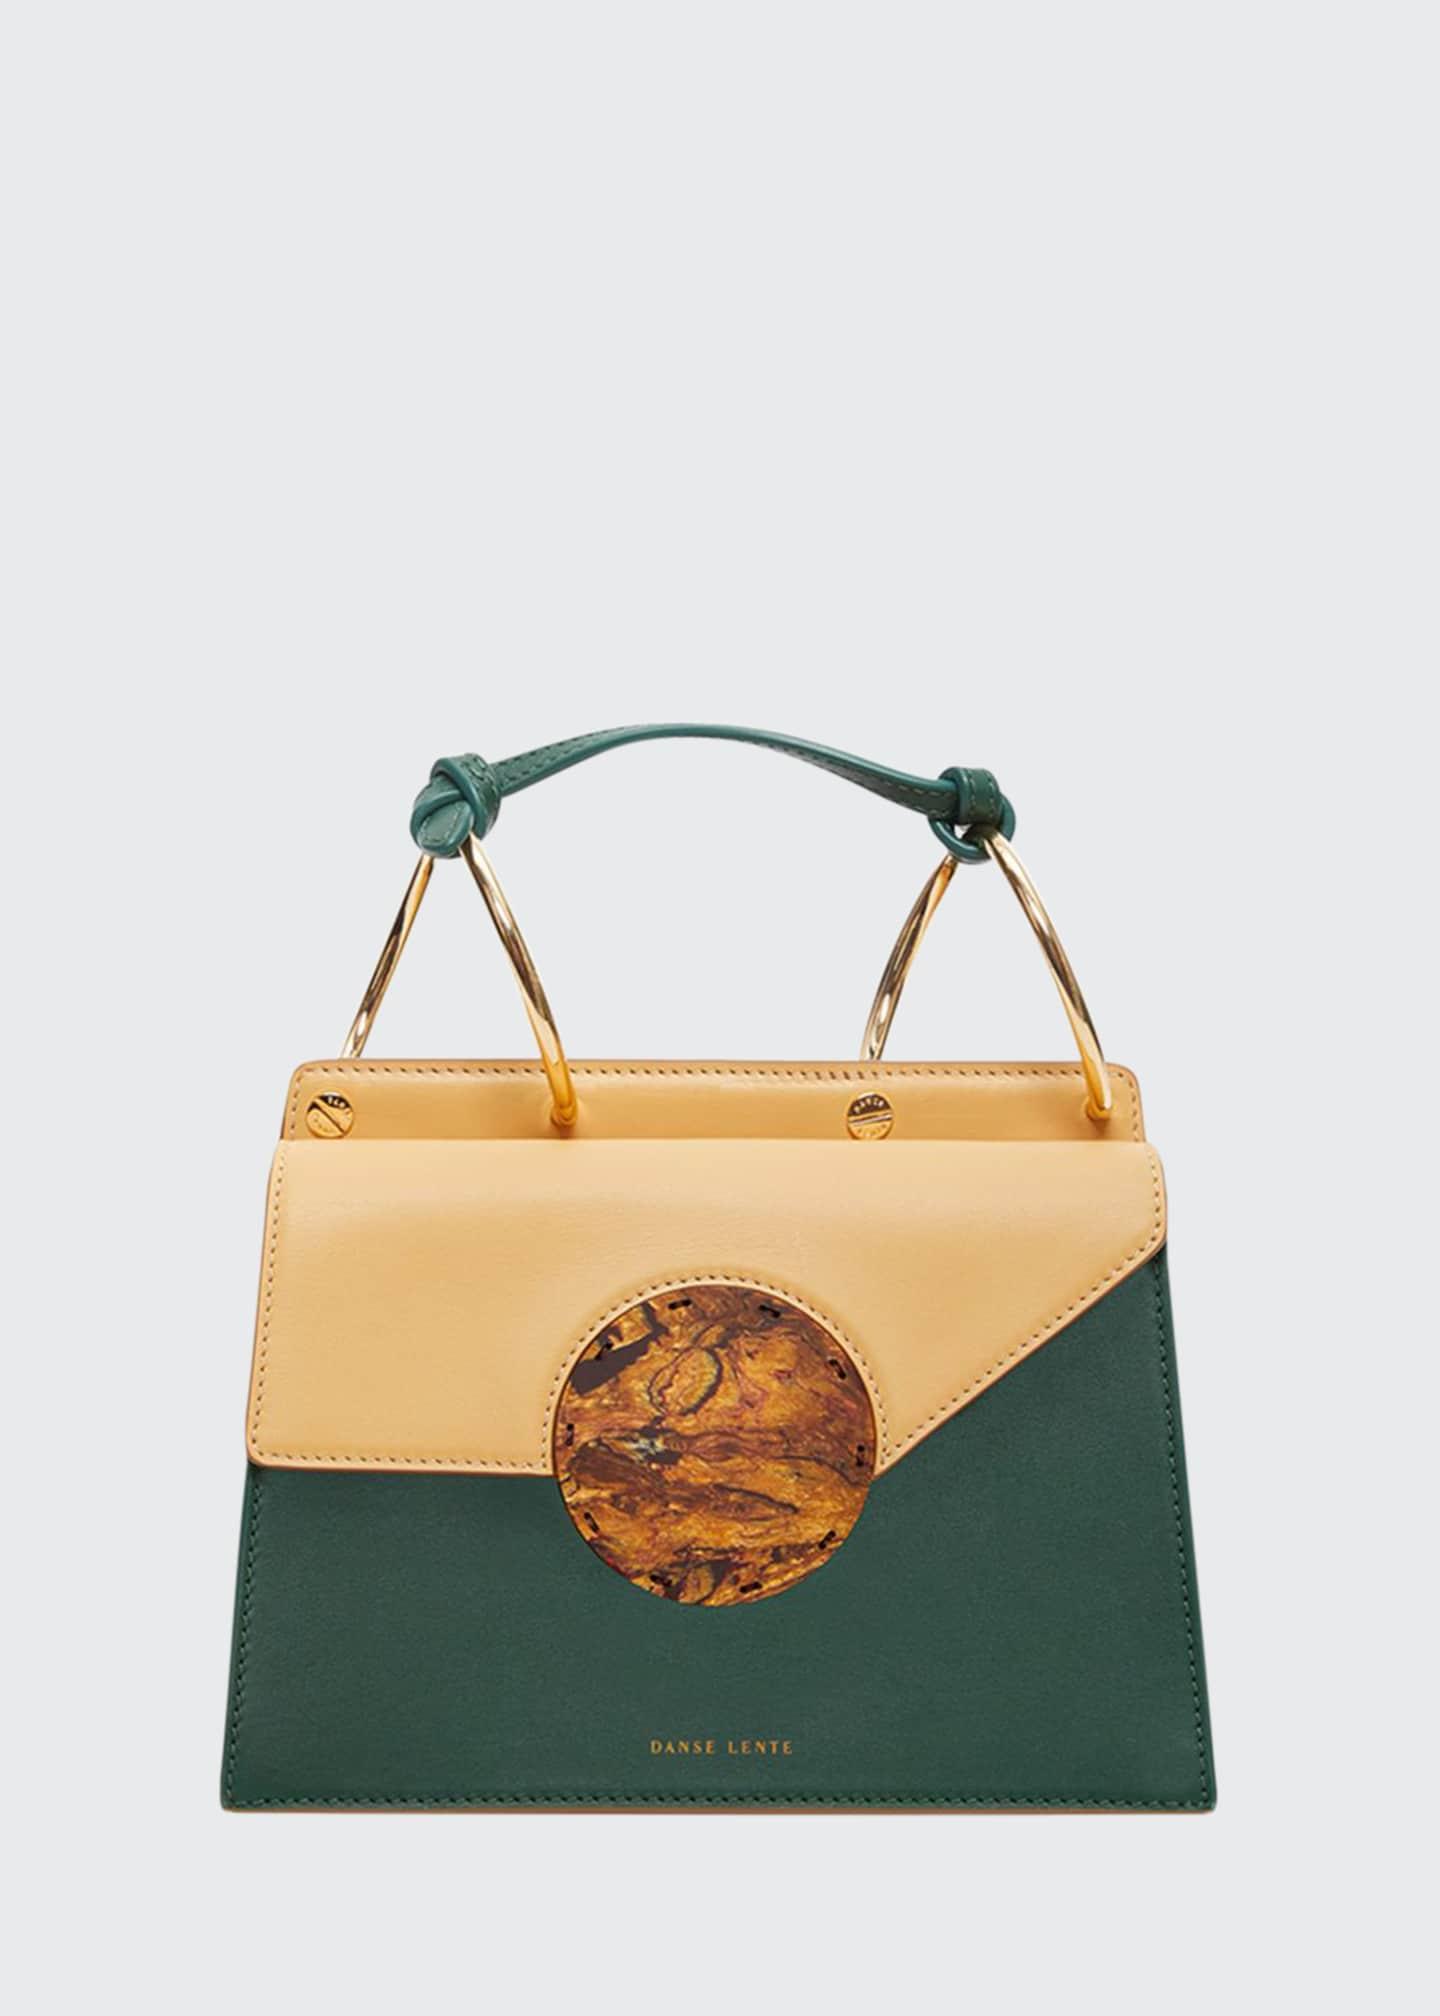 Danse Lente Phoebe Bis Leather Top-Handle Bag